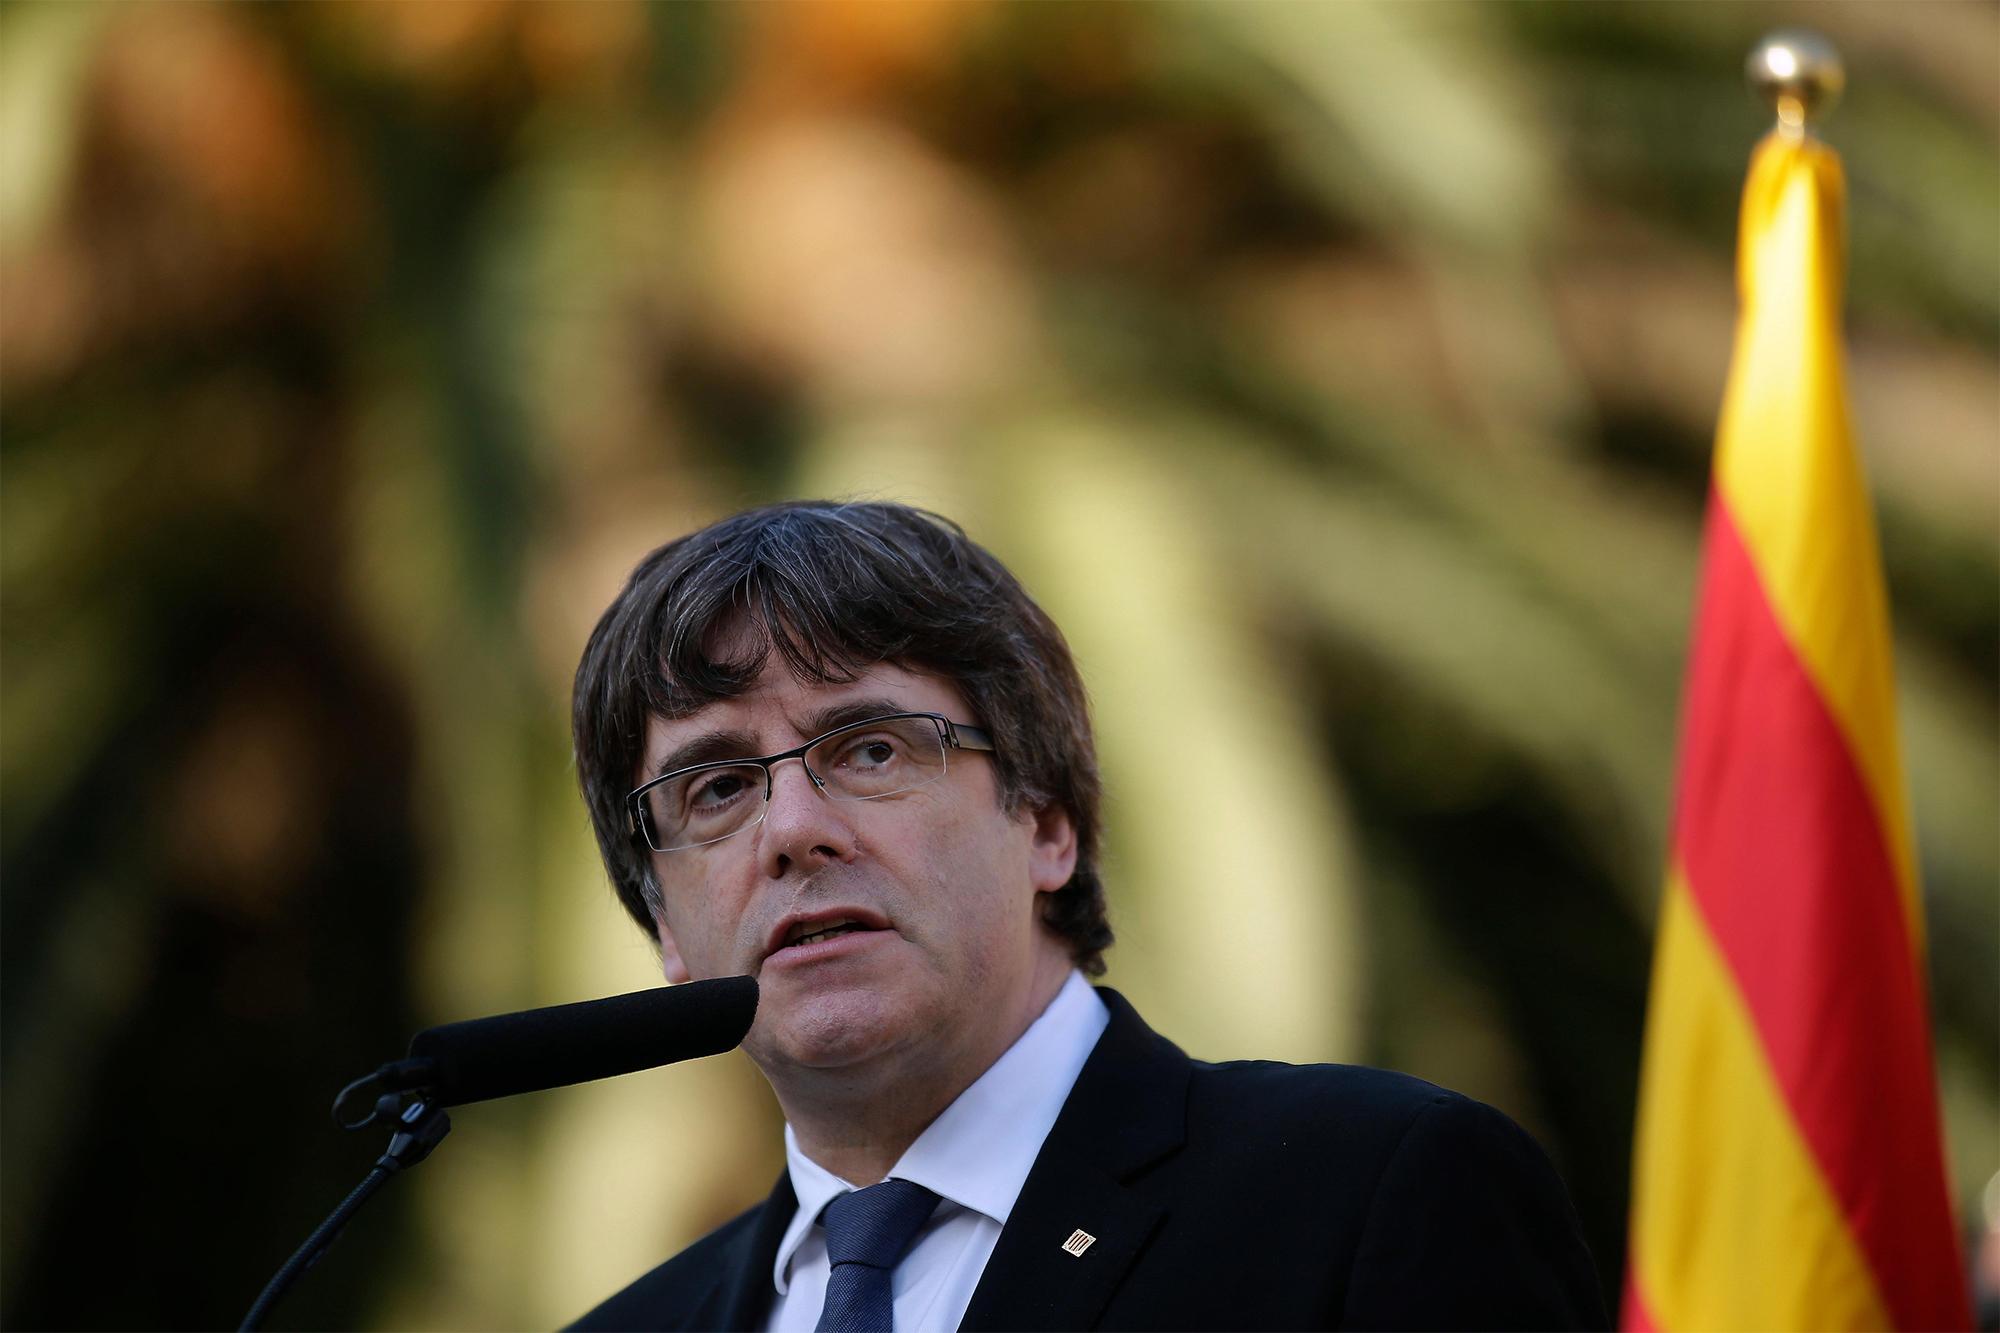 Carles Puigdemont Belgium